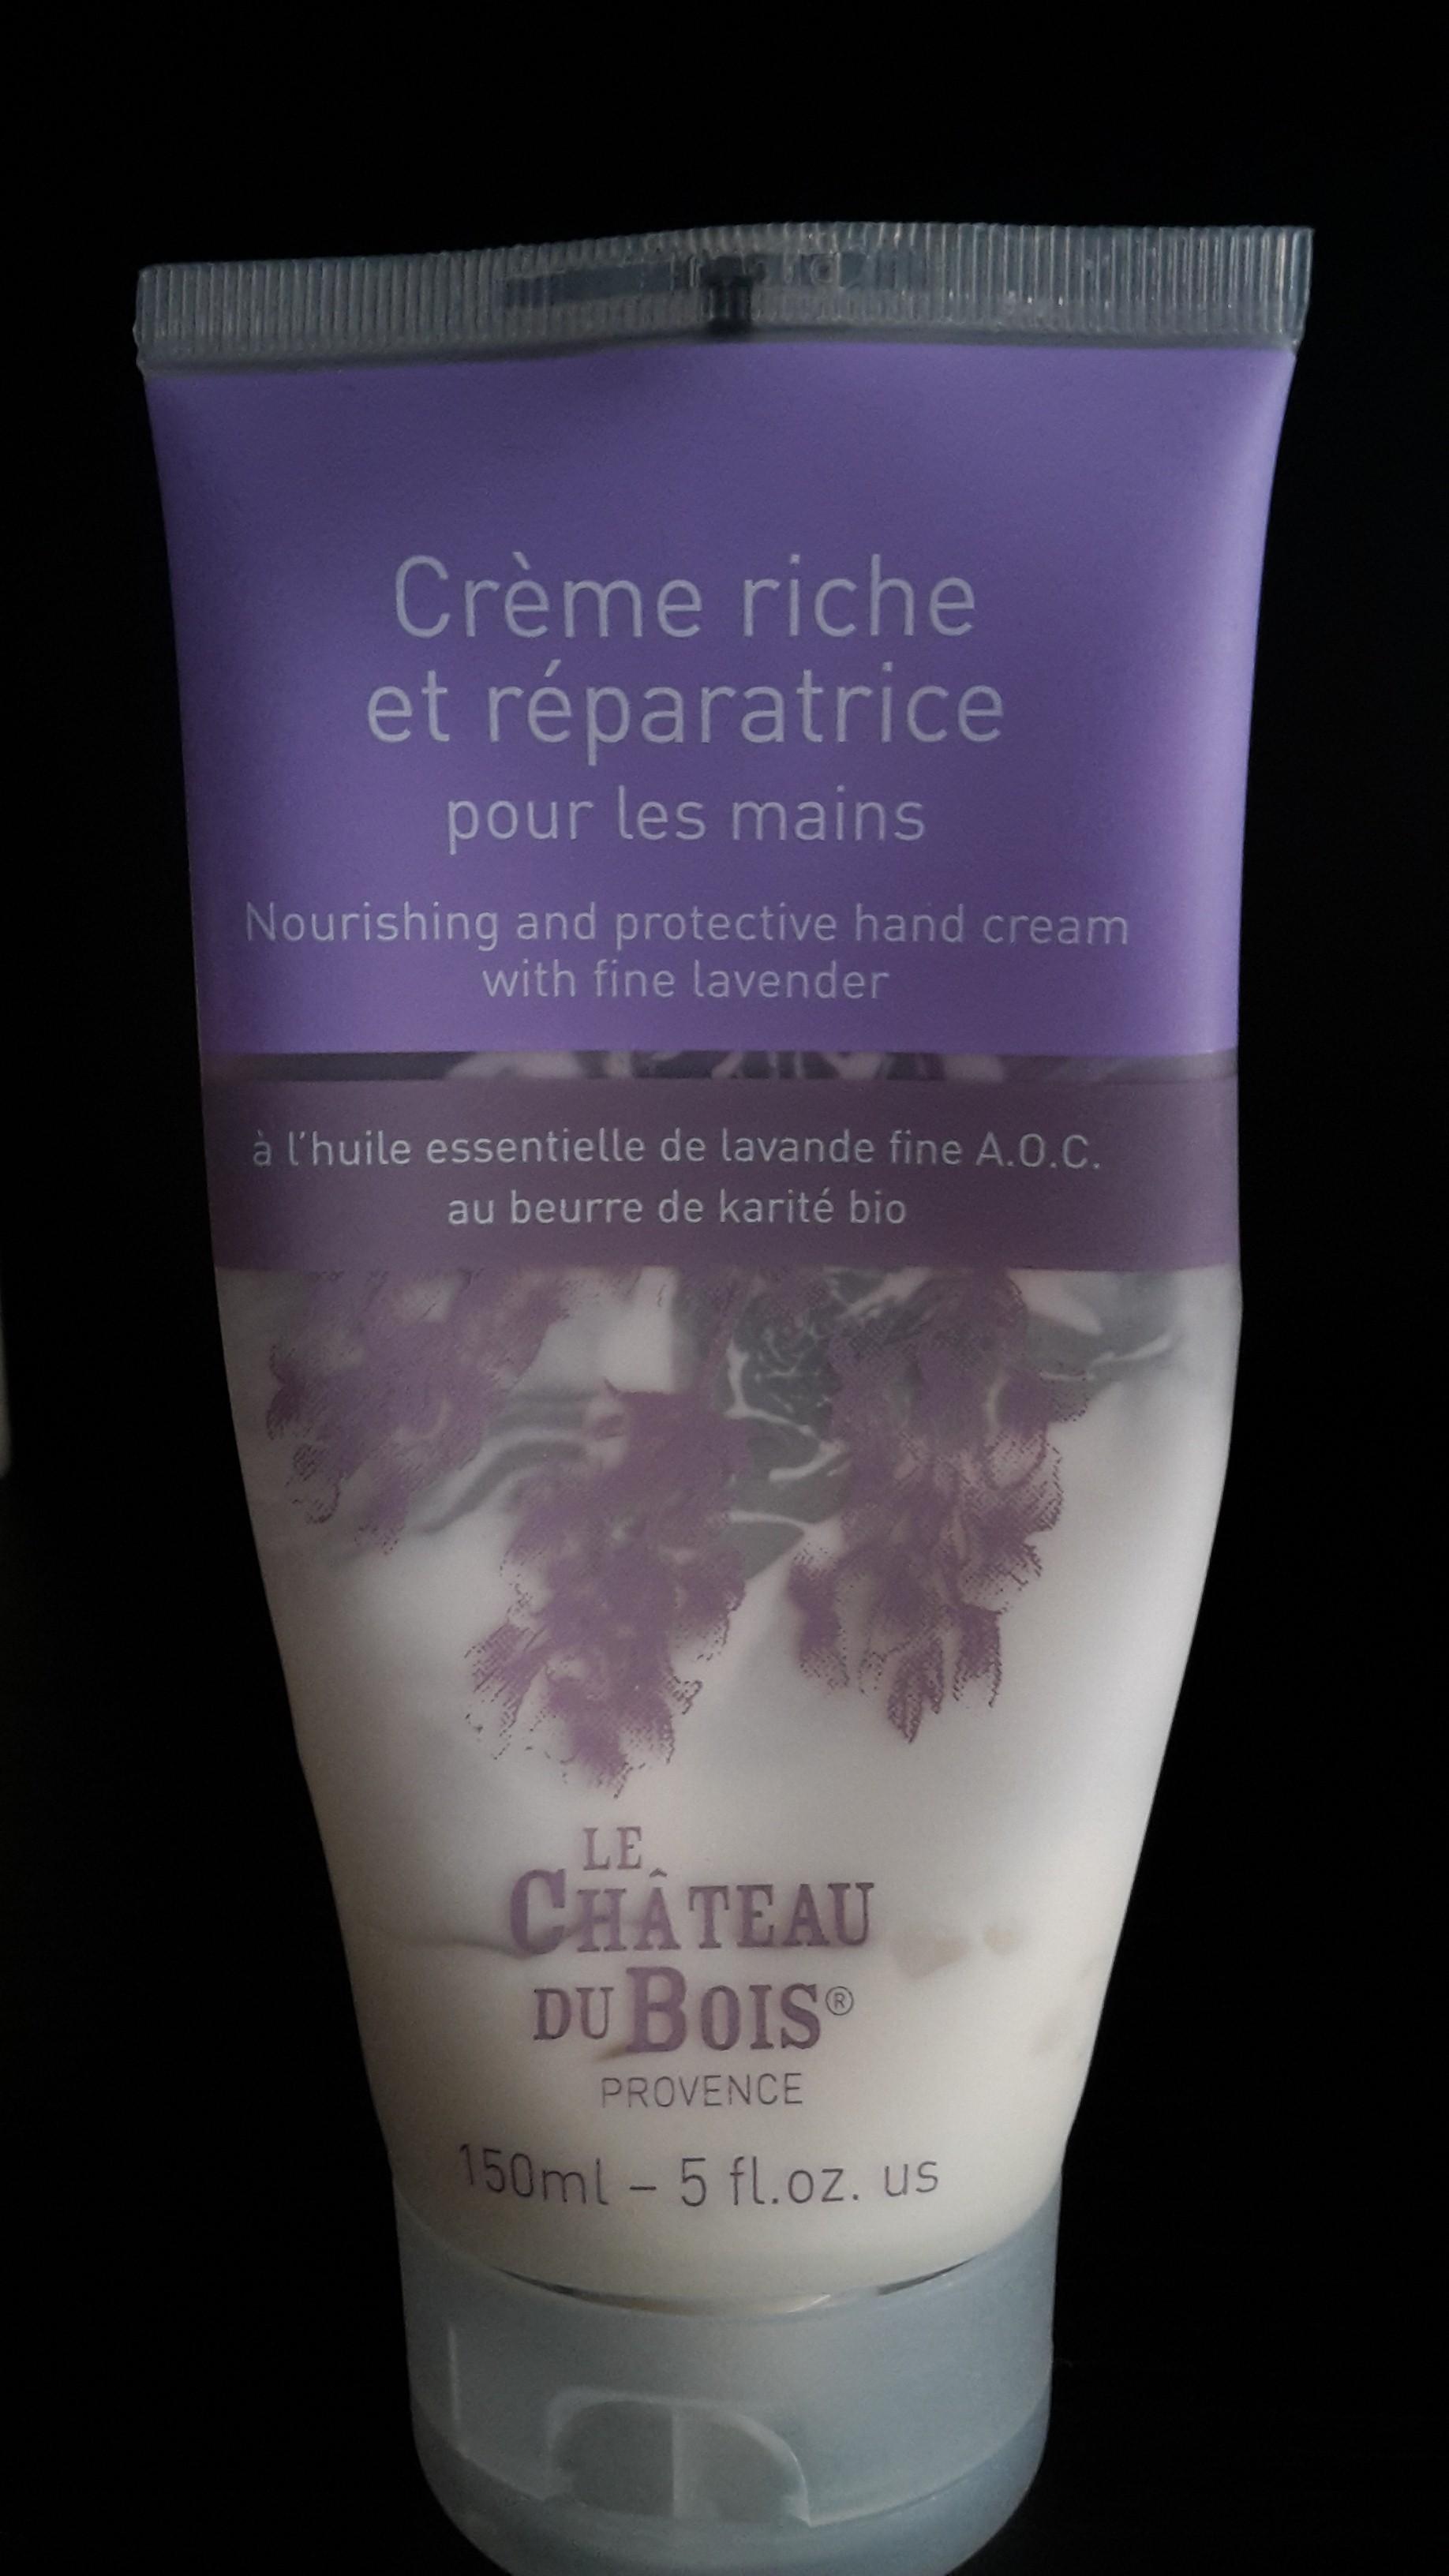 Crema mani riparatrice Le Chateau du Bois: recensione